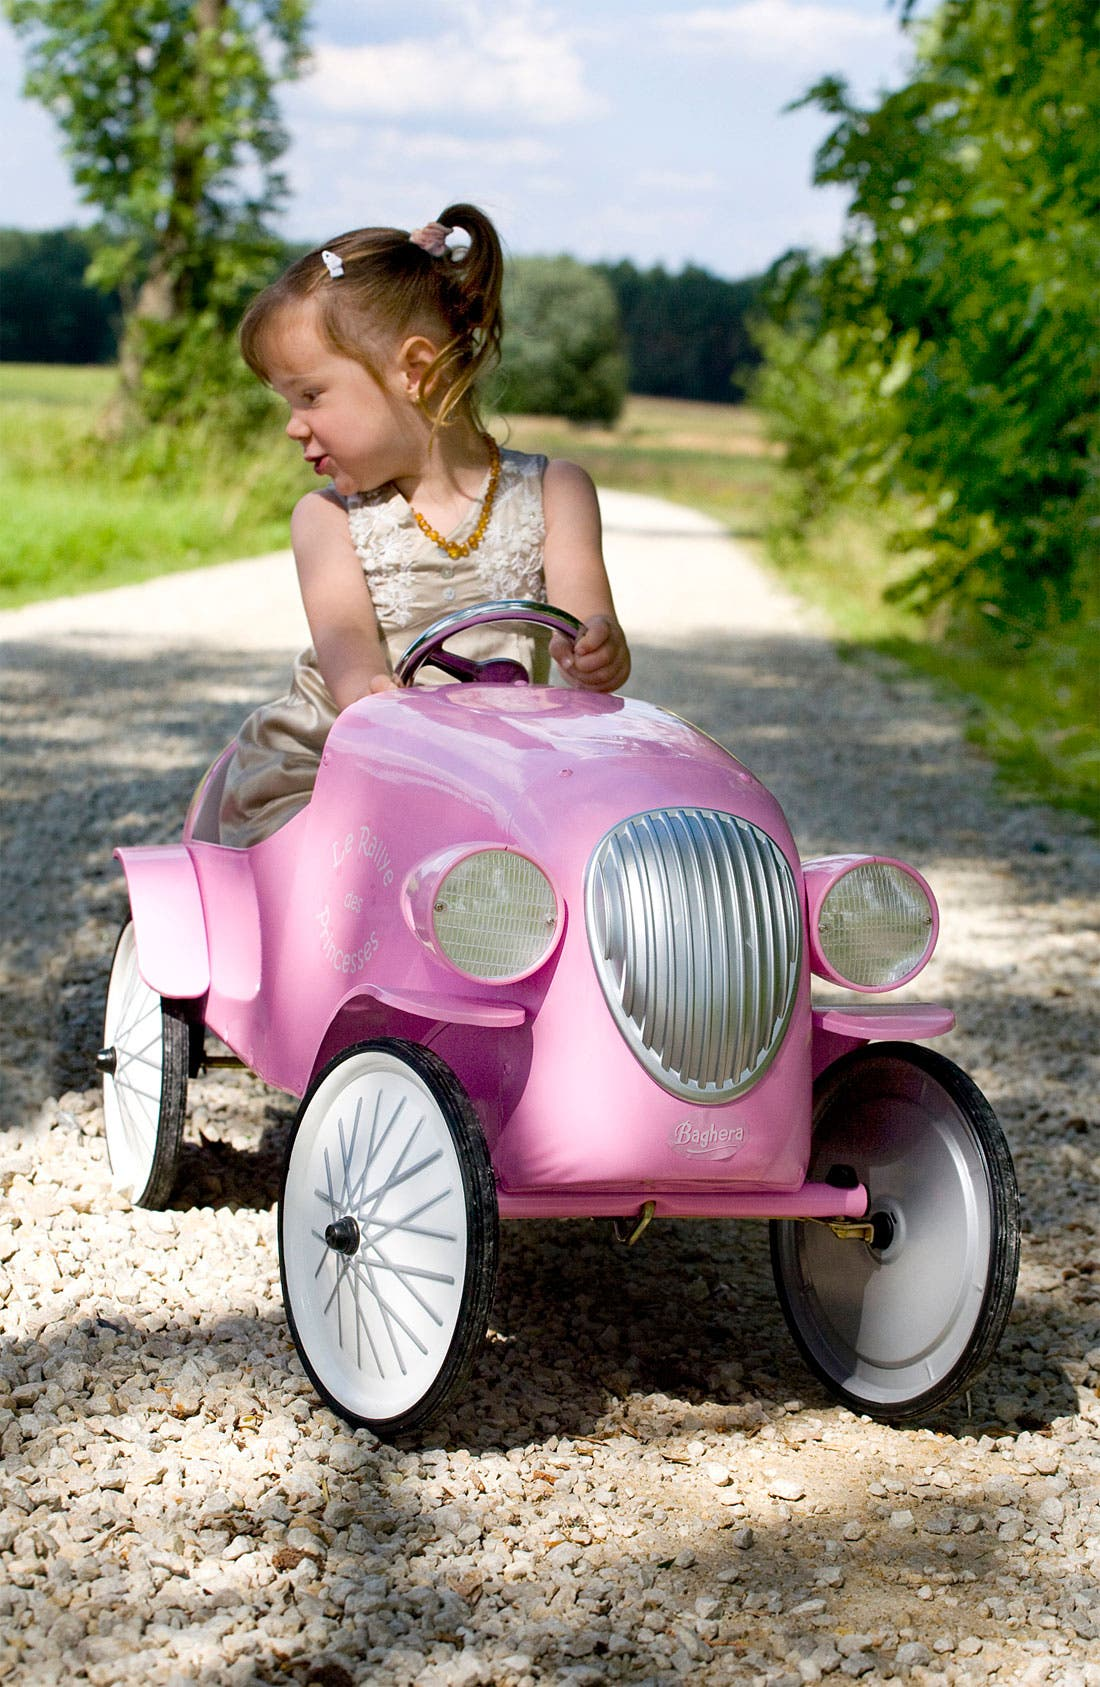 Alternate Image 2  - Baghera 'Le Mans' Pedal Car (Toddler Girls)